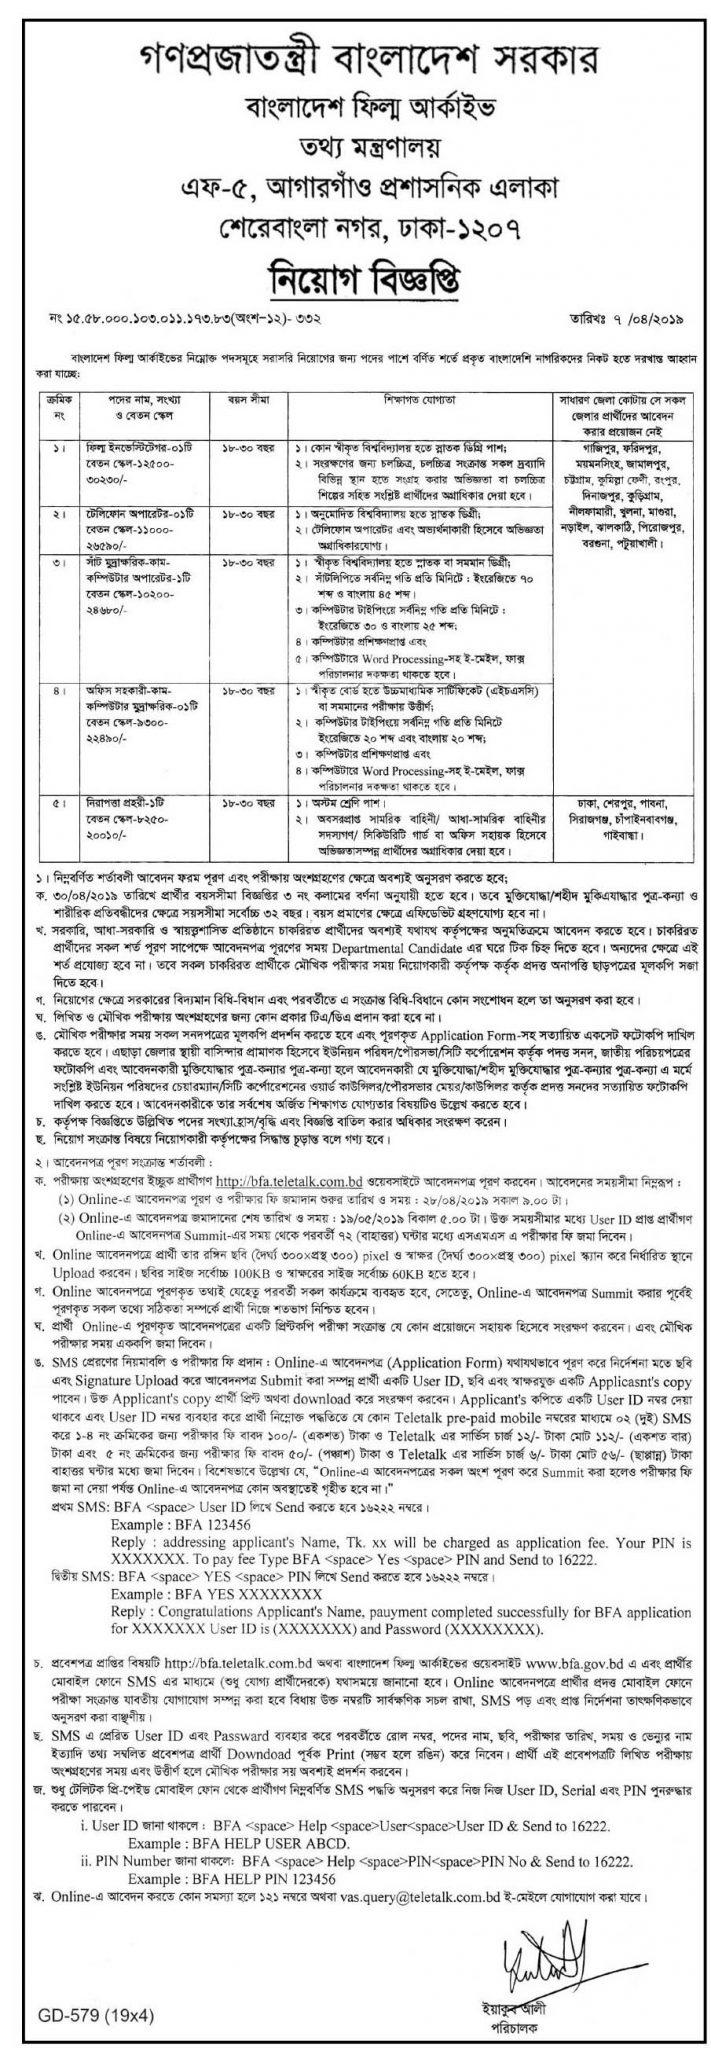 Bangladesh Film Archive Job Circular 2019